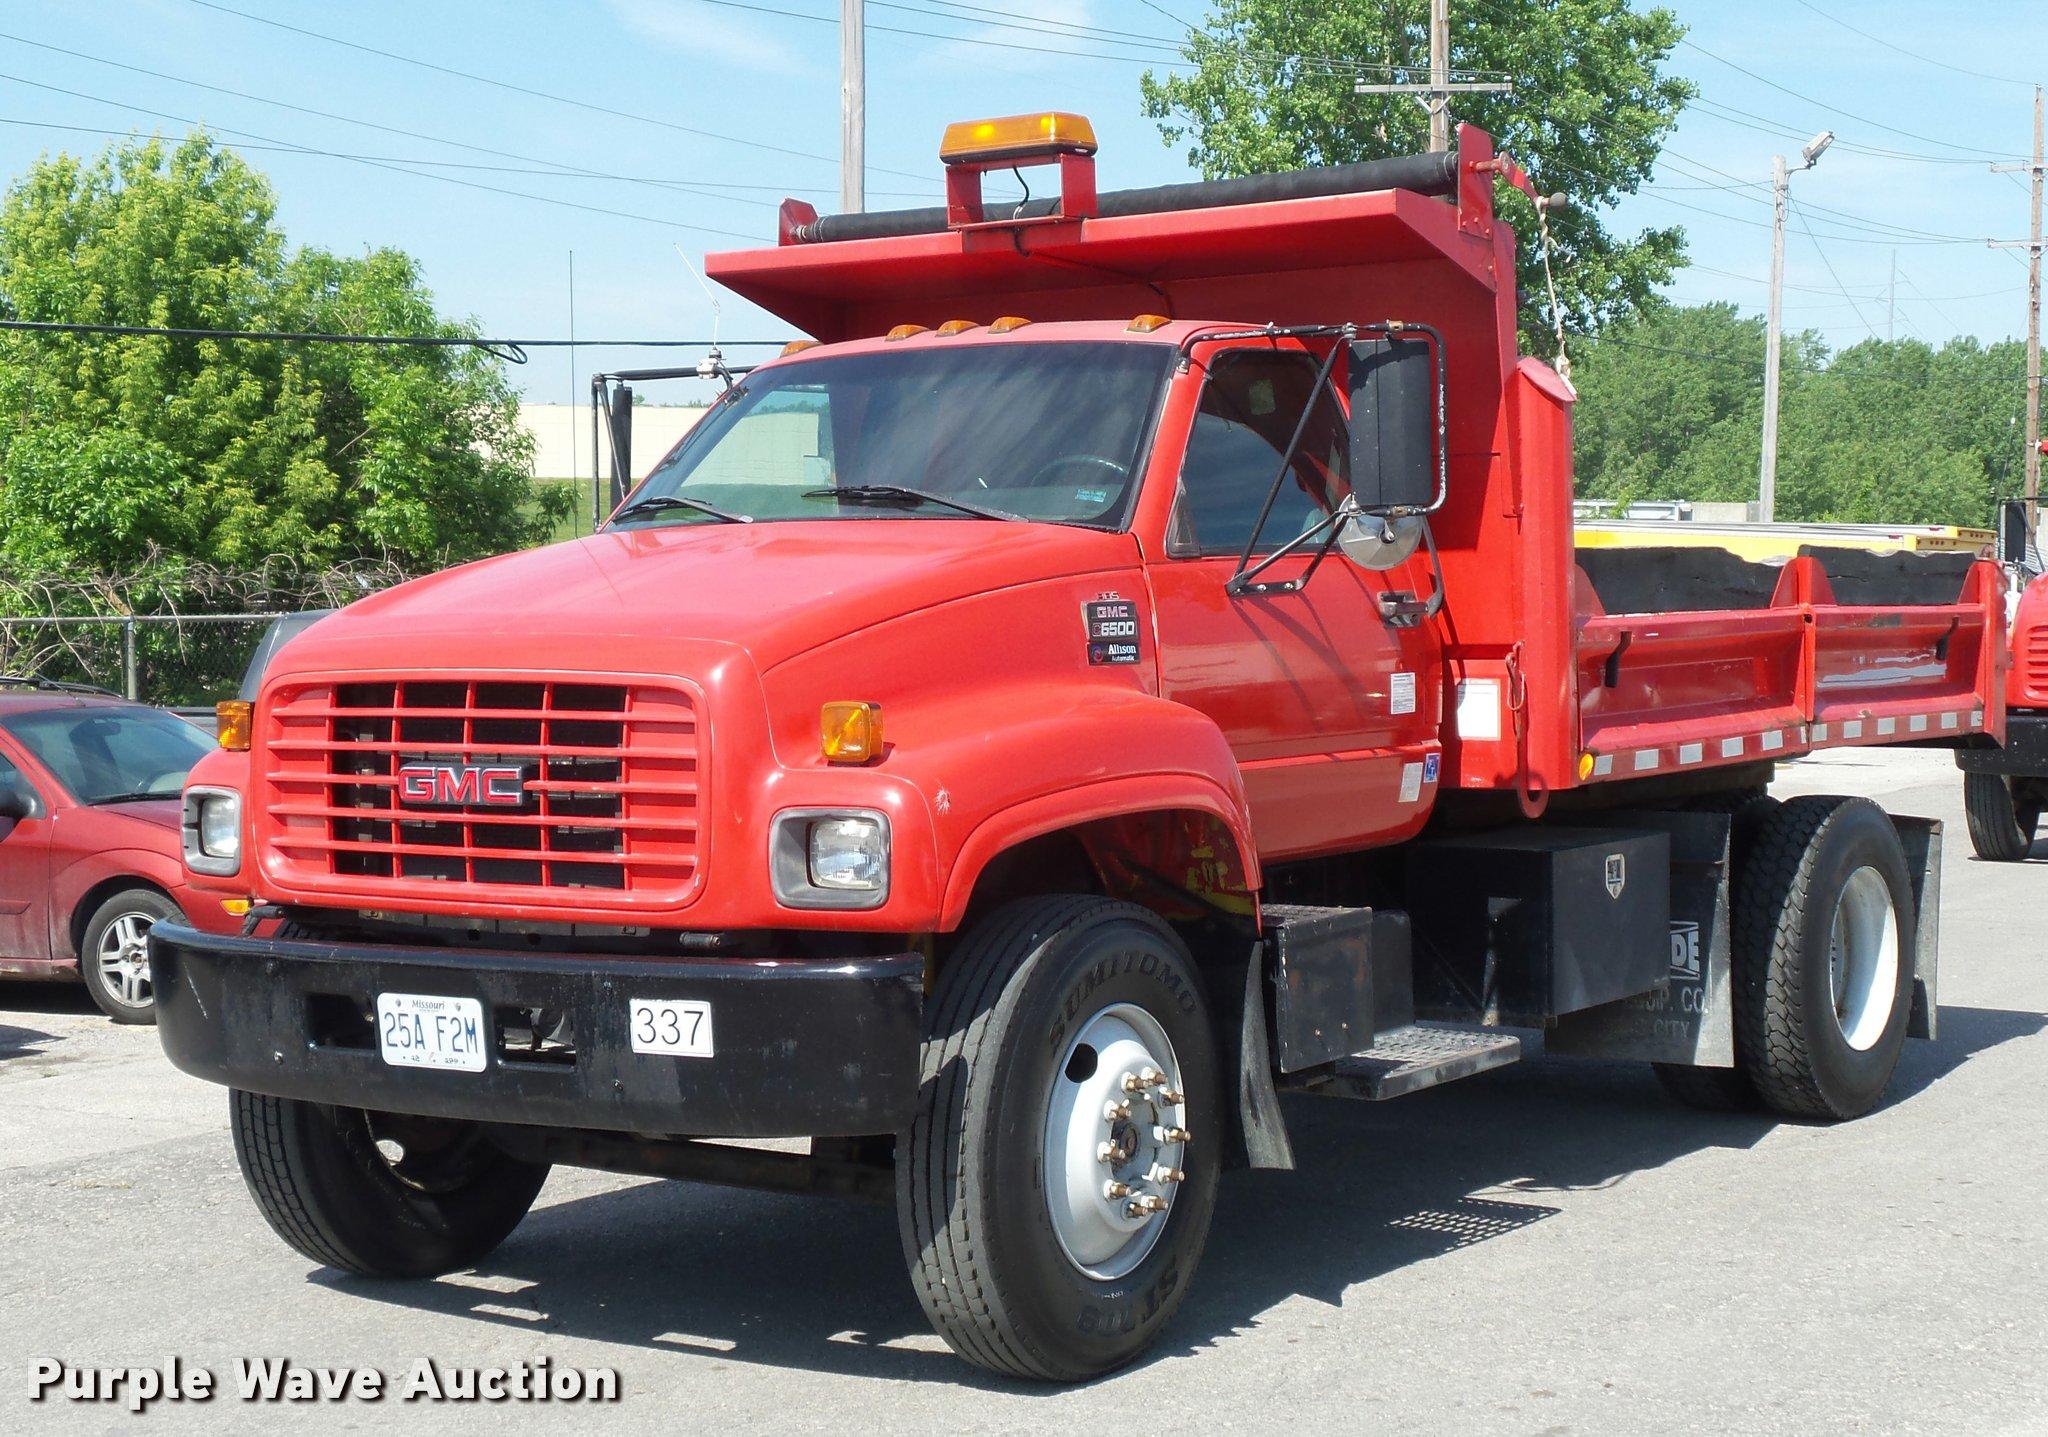 2001 gmc c6500 dump truck item dd9477 sold june 22 cons rh purplewave com 2001 GMC C6500 Transmission 2001 GMC C6500 Transmission